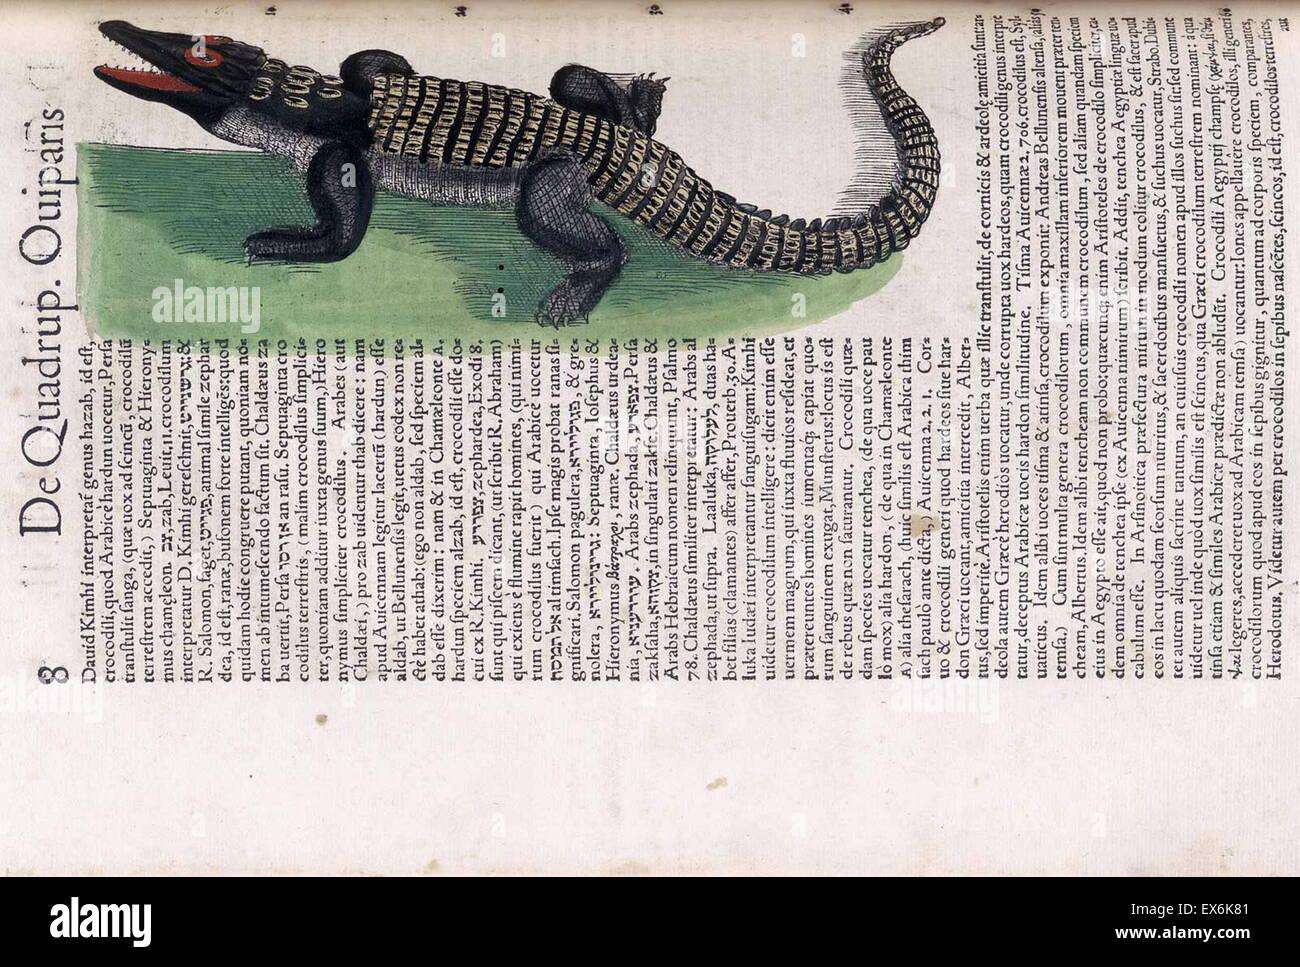 Crocodile Illustration Stockfotos & Crocodile Illustration Bilder ...